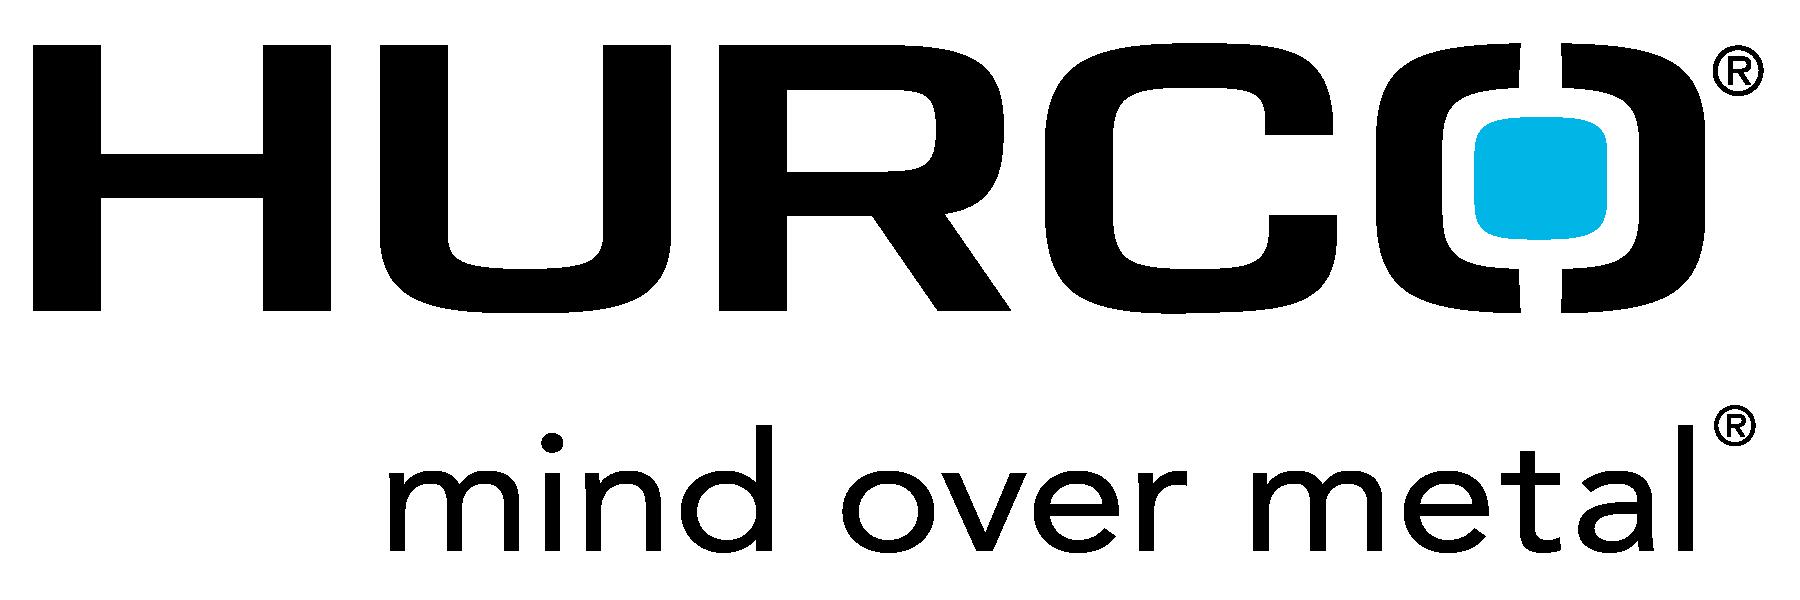 Hurco Companies, Inc. - Logo